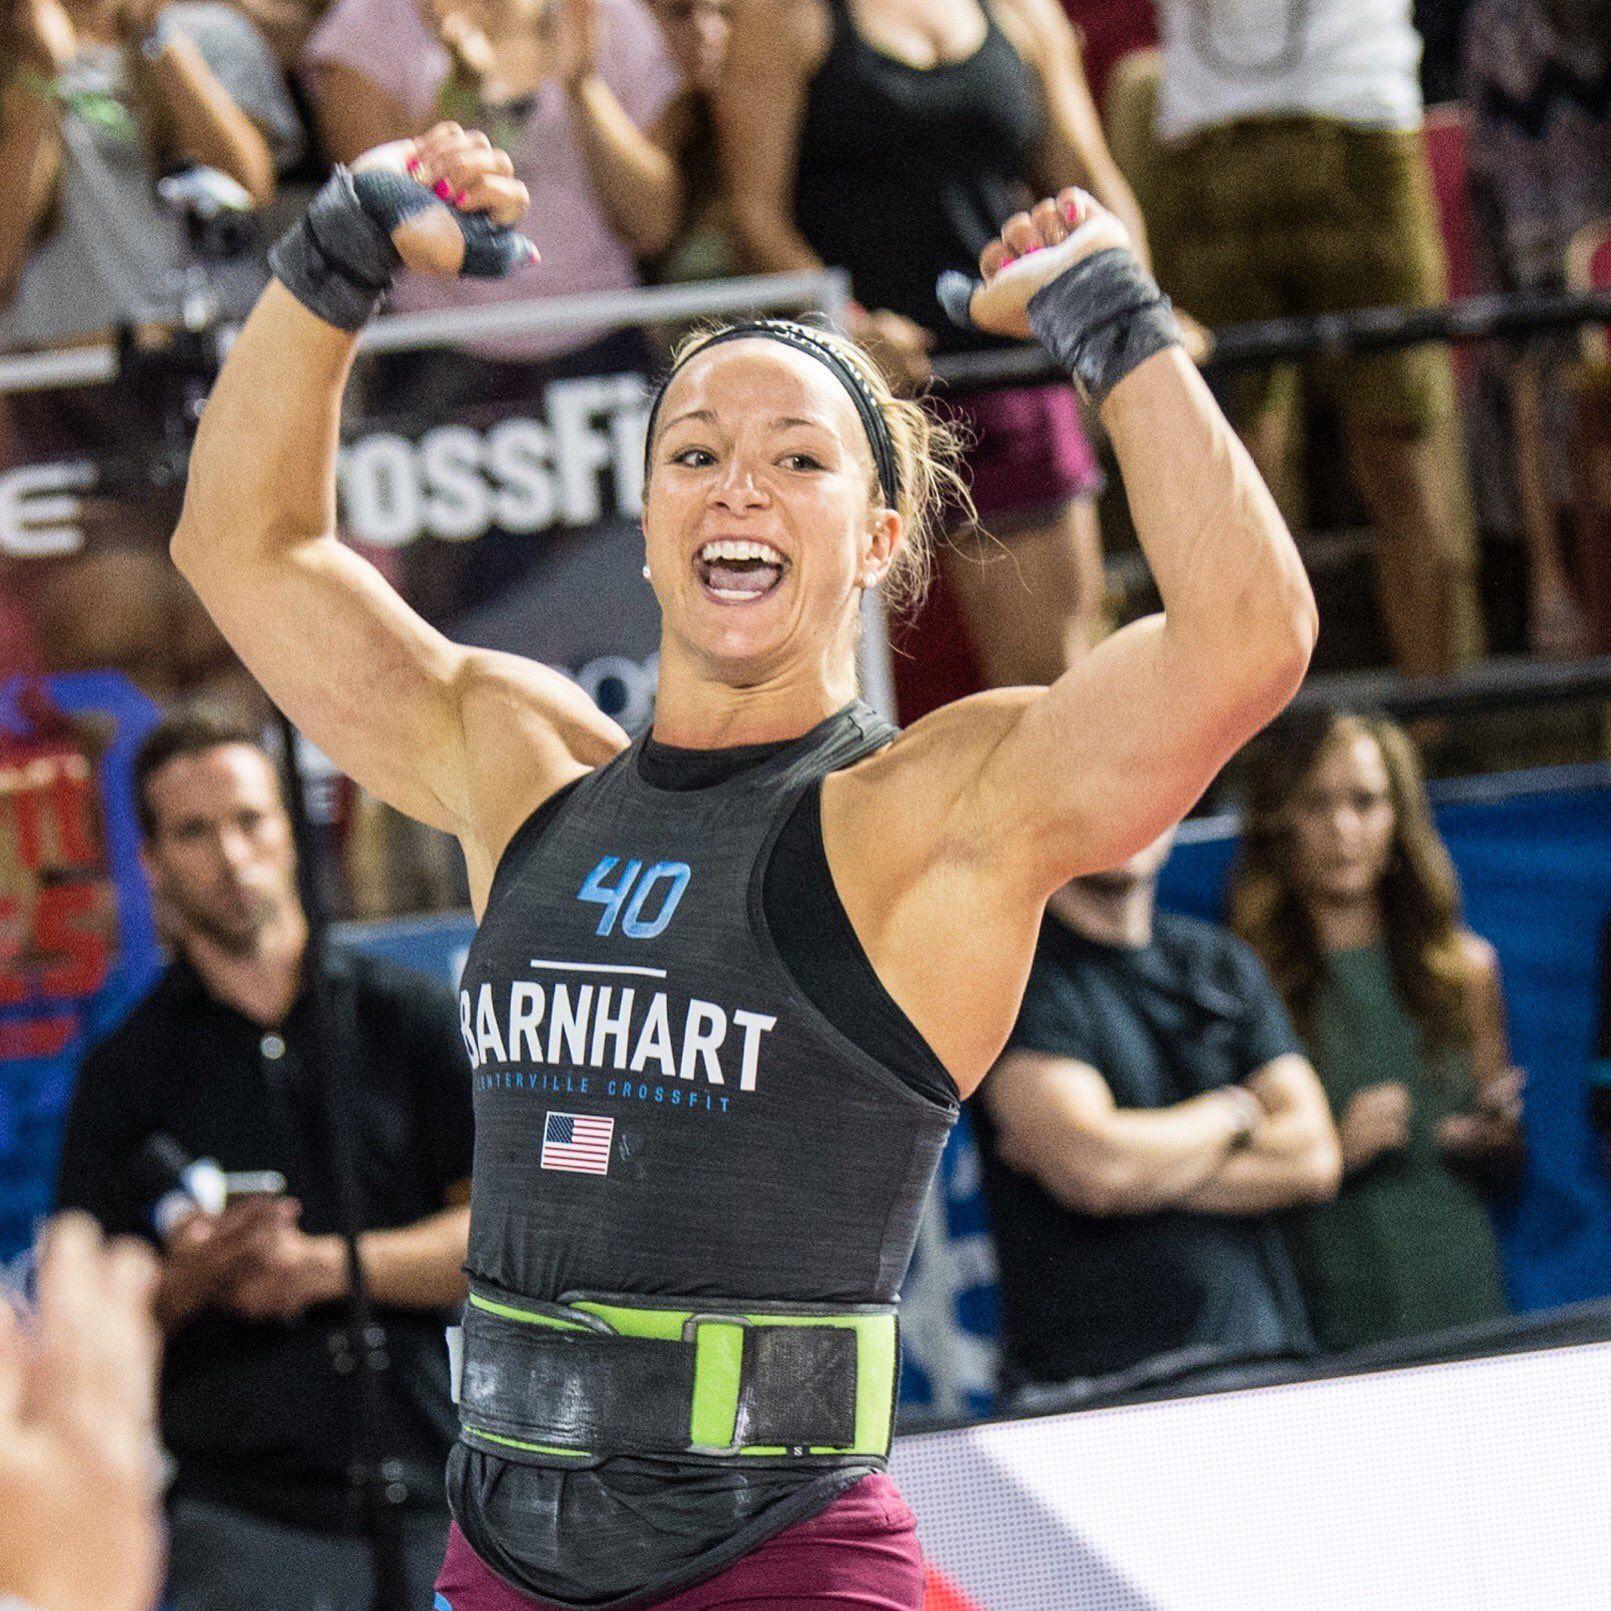 Amanda Barnhart 🇺🇸 just earned her first CrossFit Games